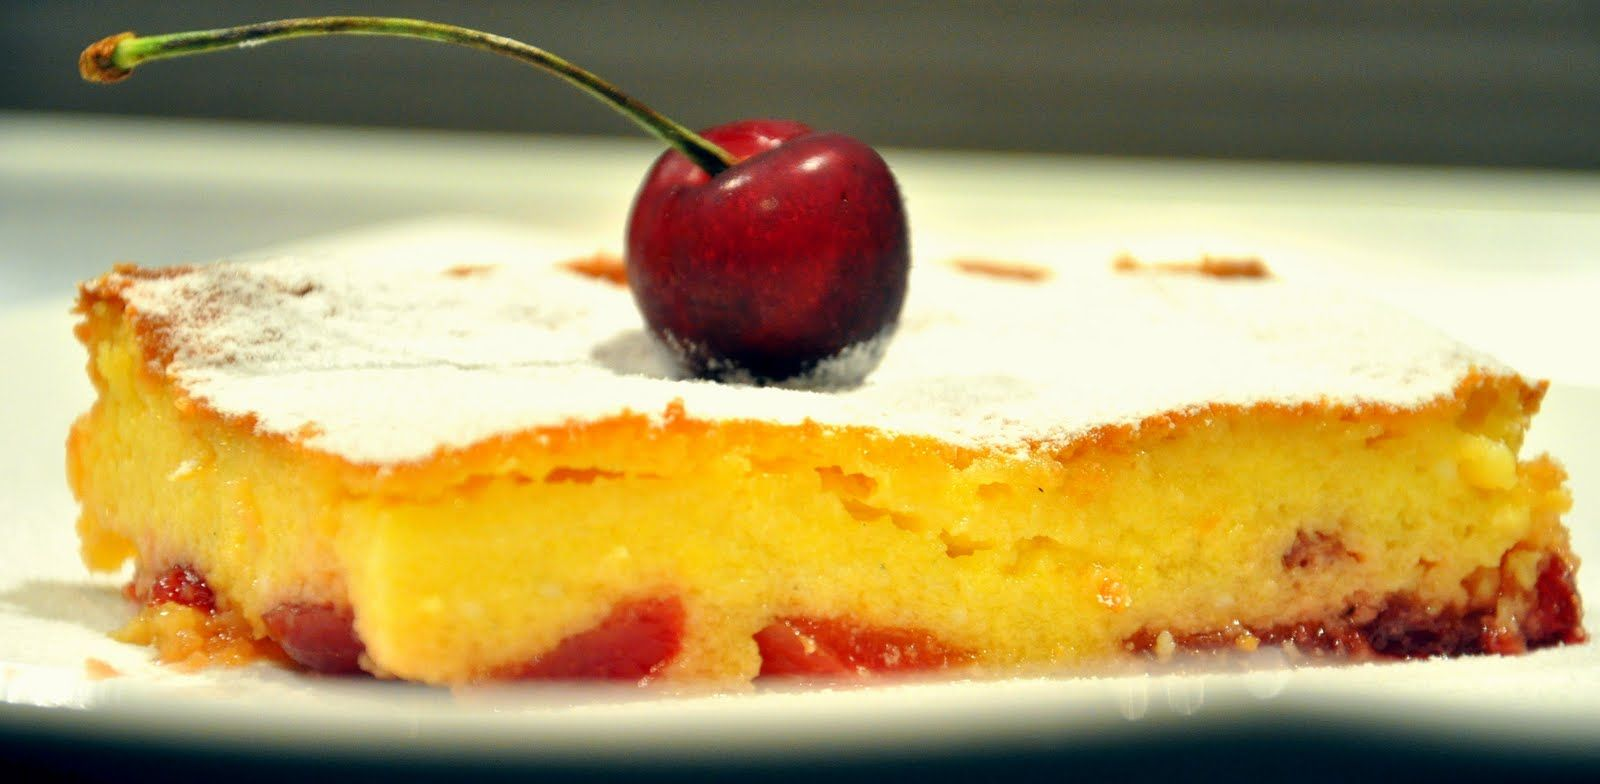 cheese+cake+s+%25C4%258De%25C5%25A1njami.jpg